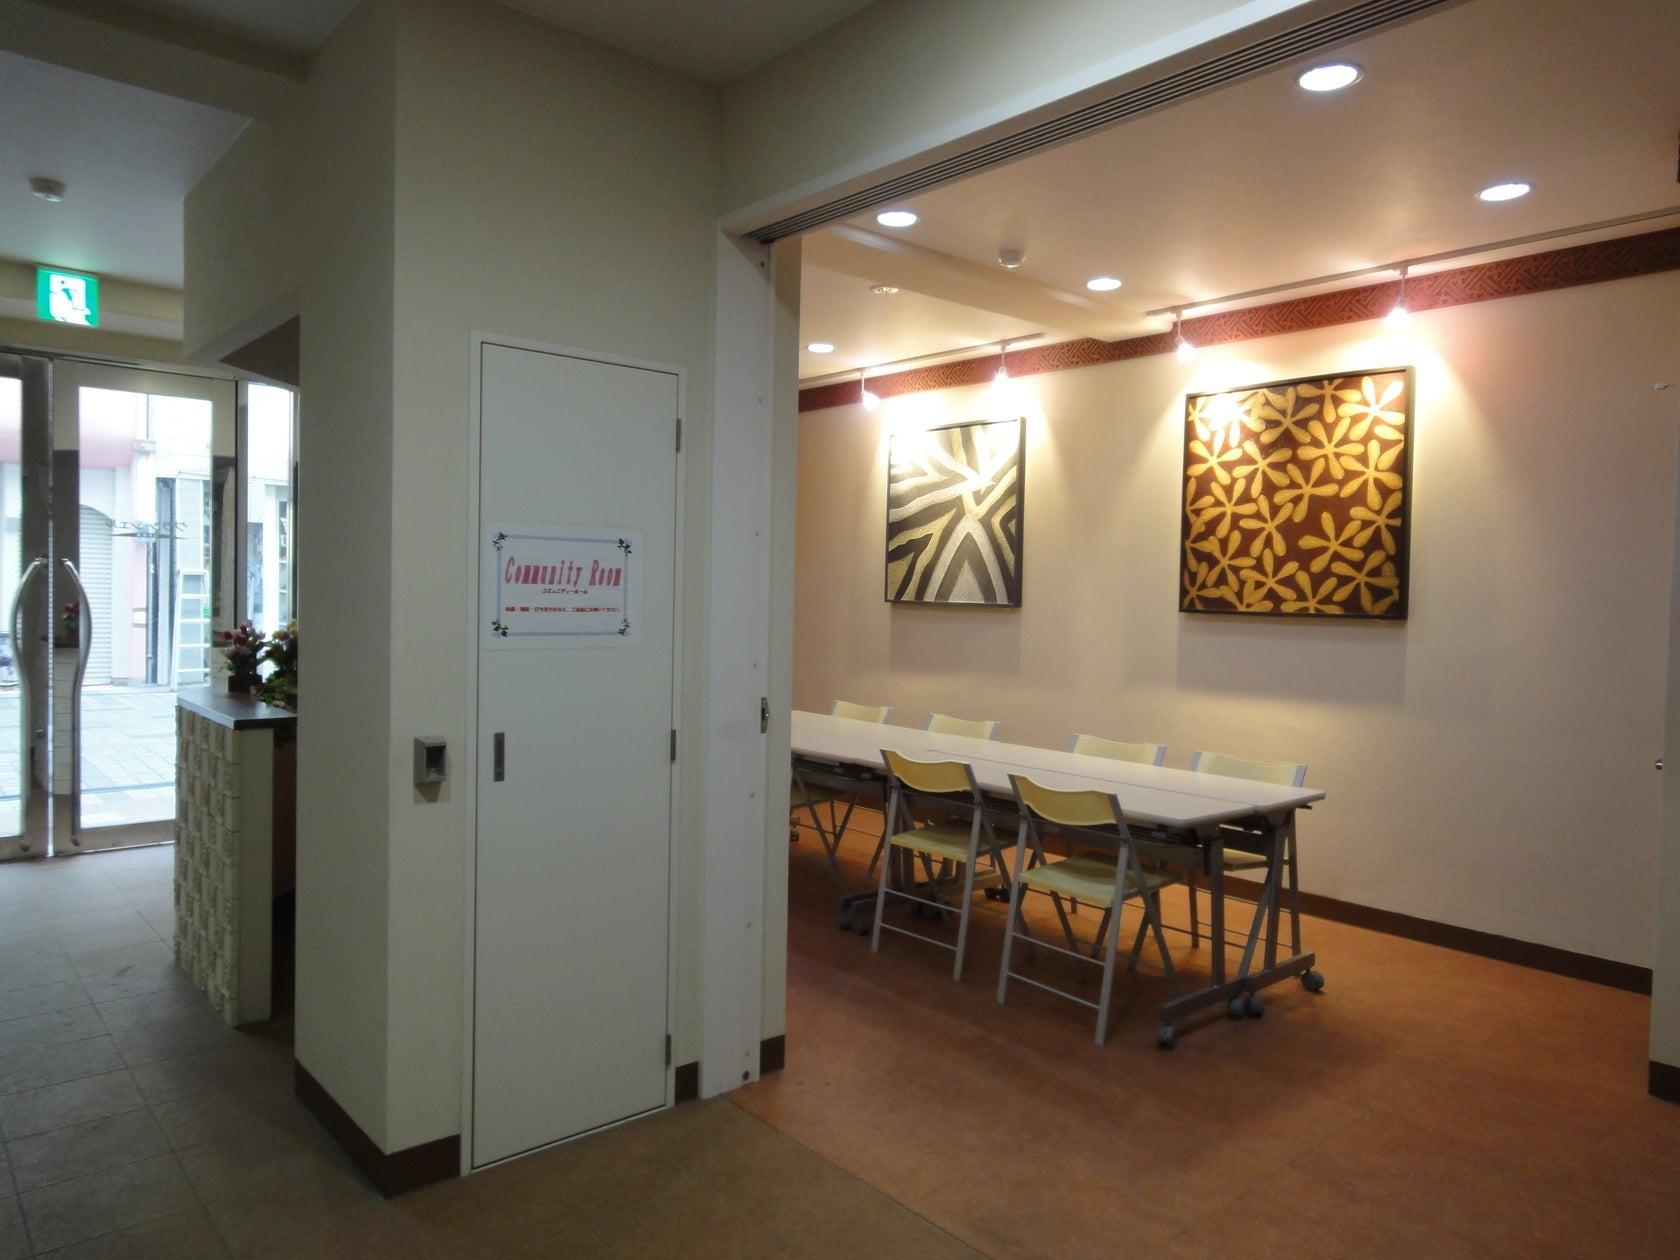 JR福井駅から徒歩3分!ミーティング・研修などにオススメ! のサムネイル